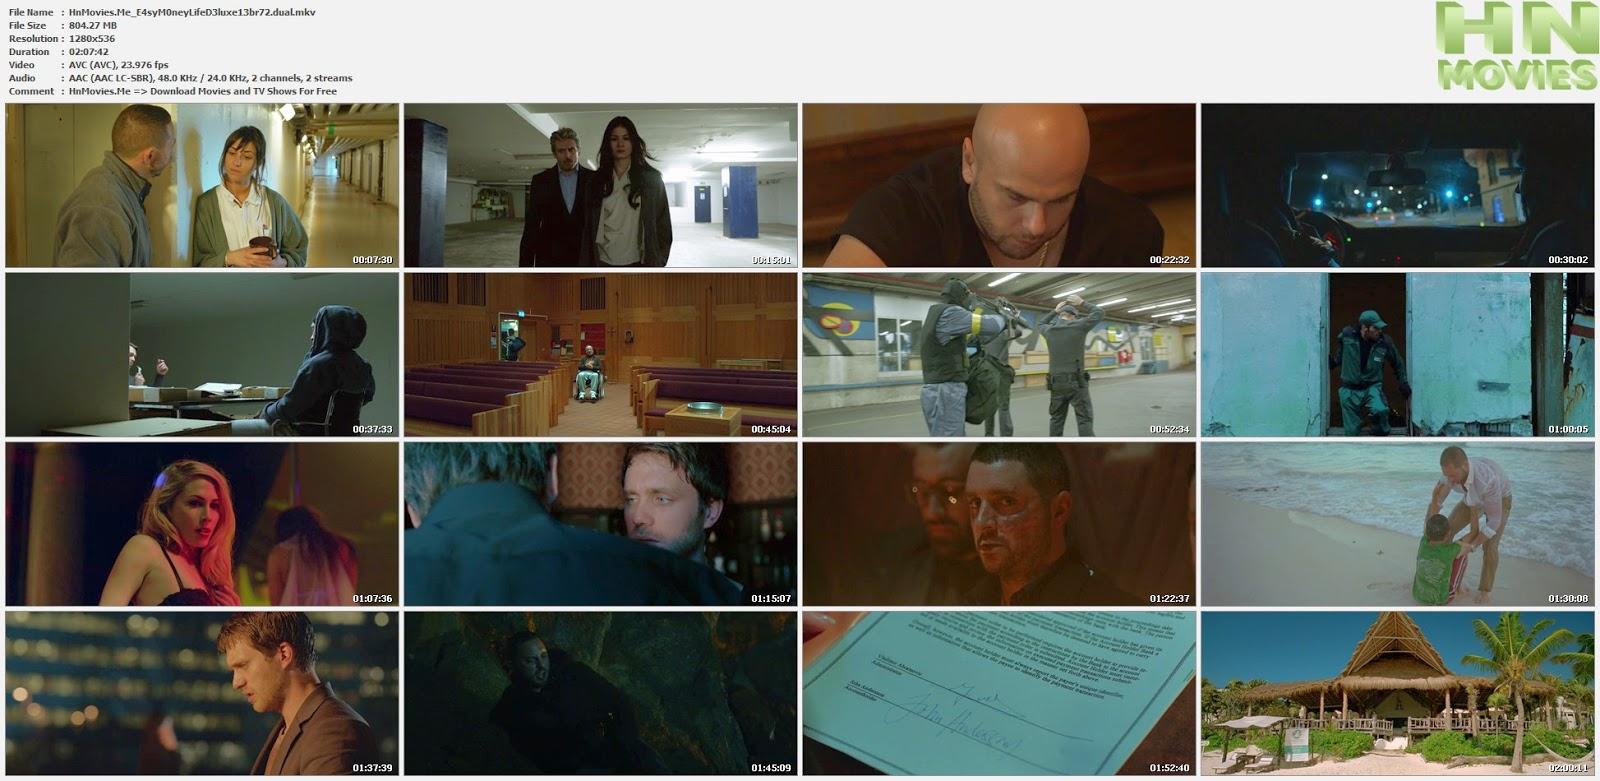 movie screenshot of Easy Money Life Deluxe fdmovie.com